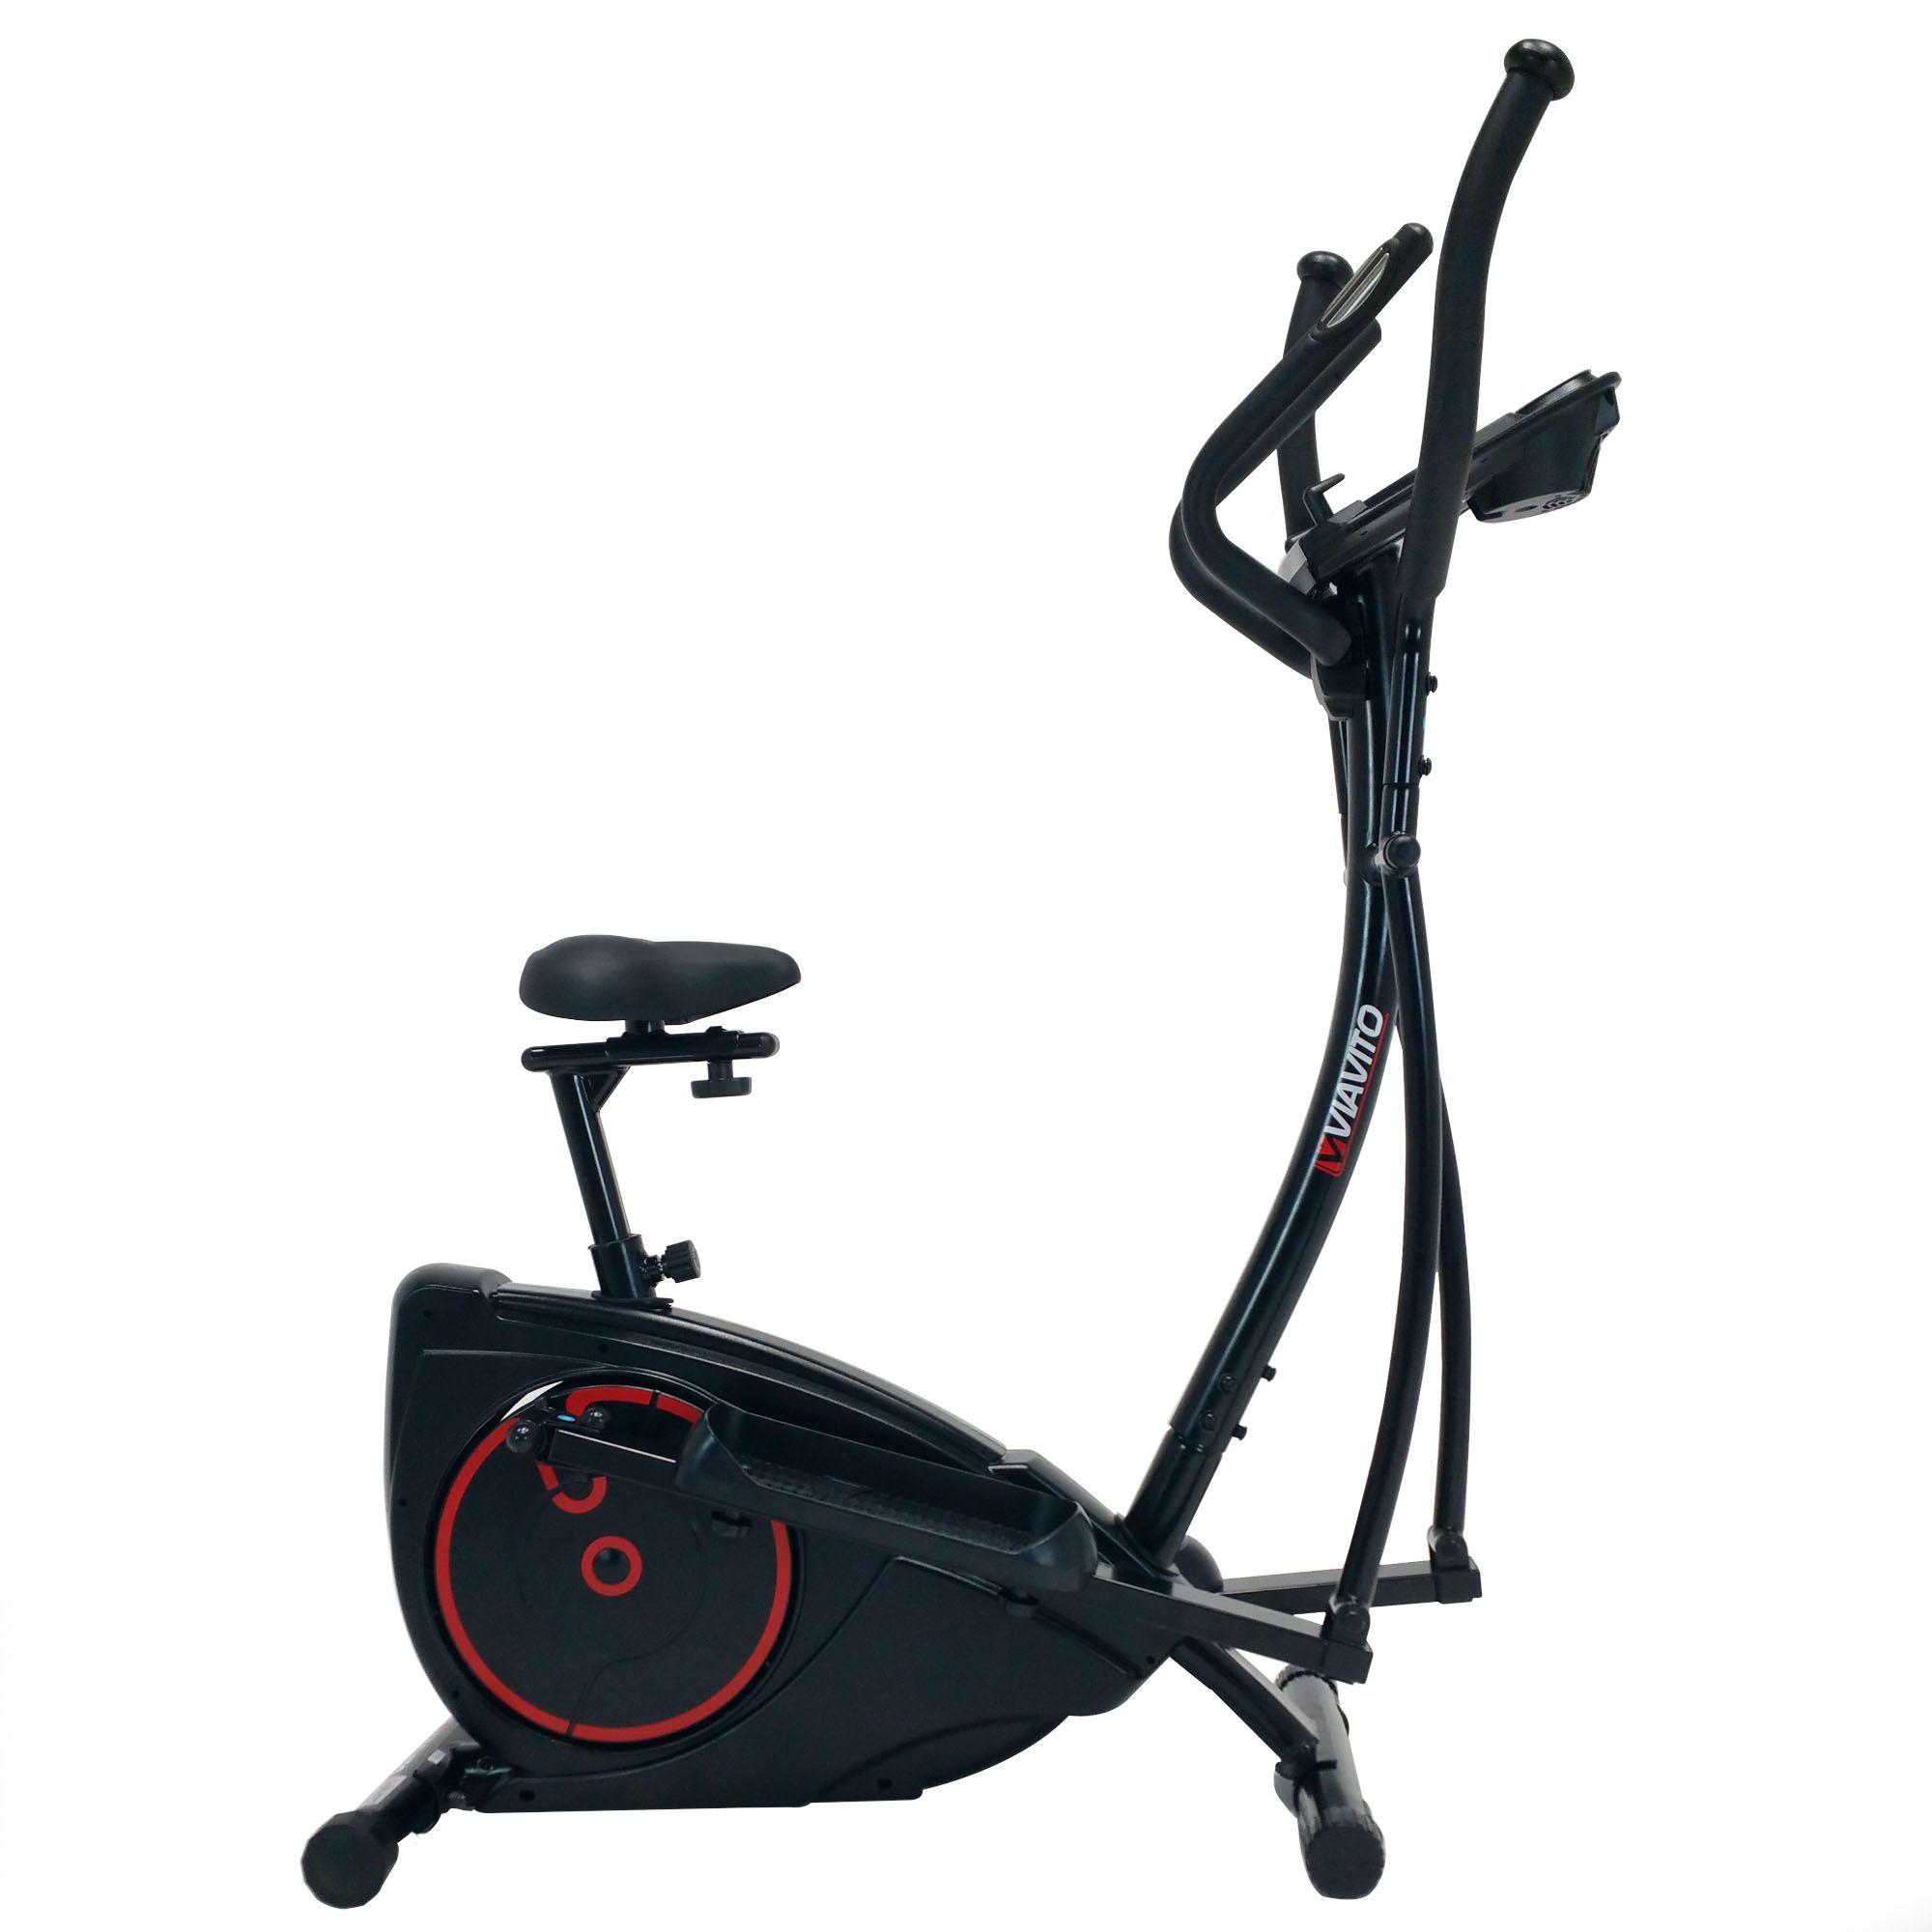 Elliptical Bike Pictures: Viavito Setry 2 In 1 Elliptical Trainer & Exercise Bike